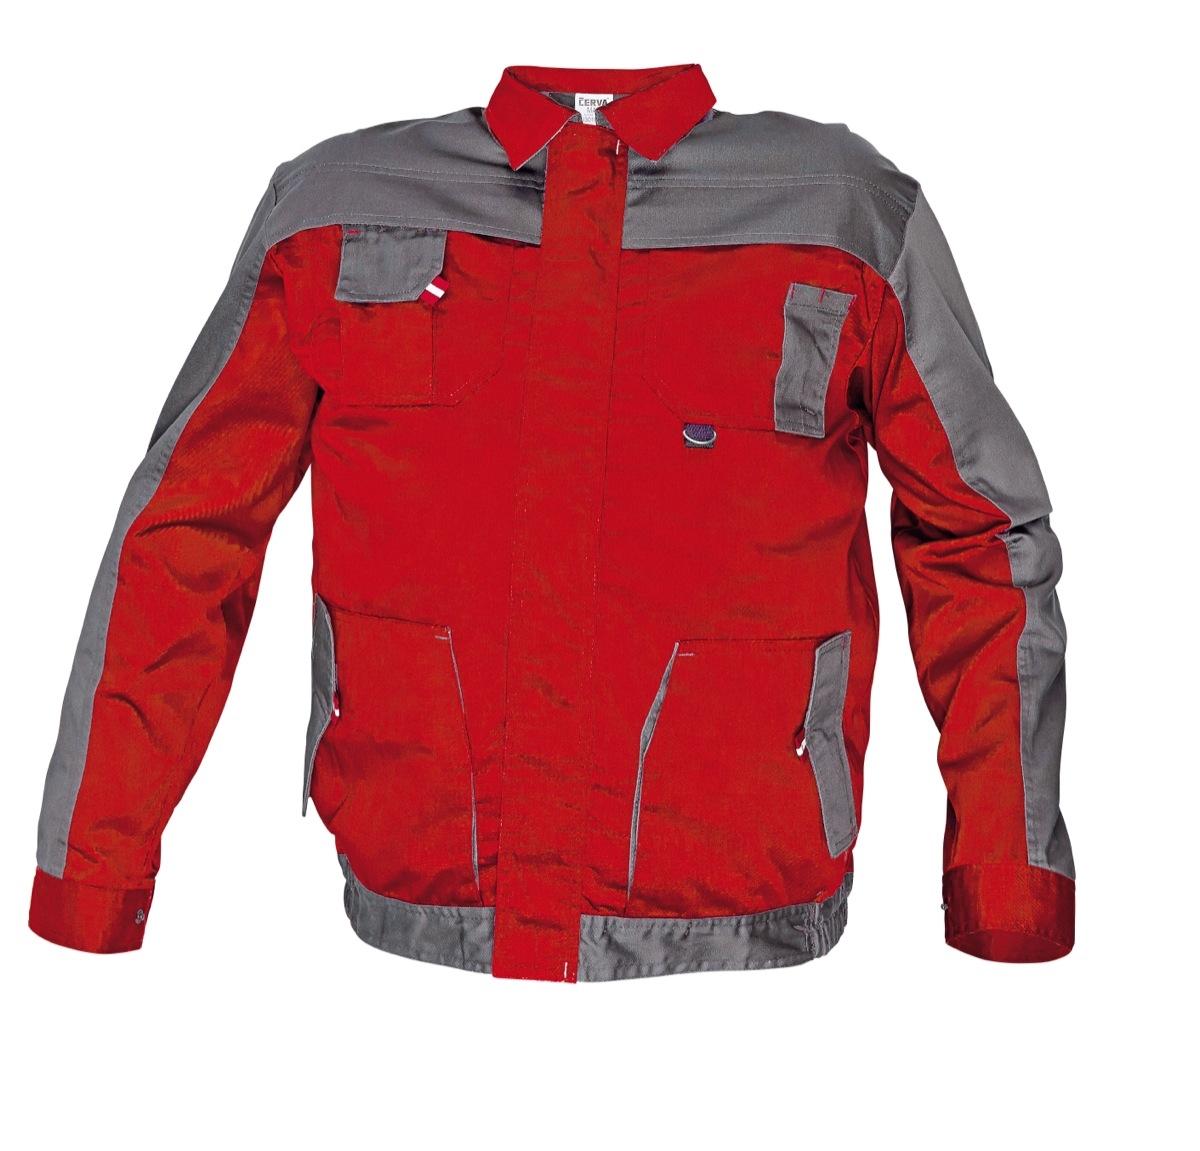 MAX EVOLUTION dzseki piros-szürke